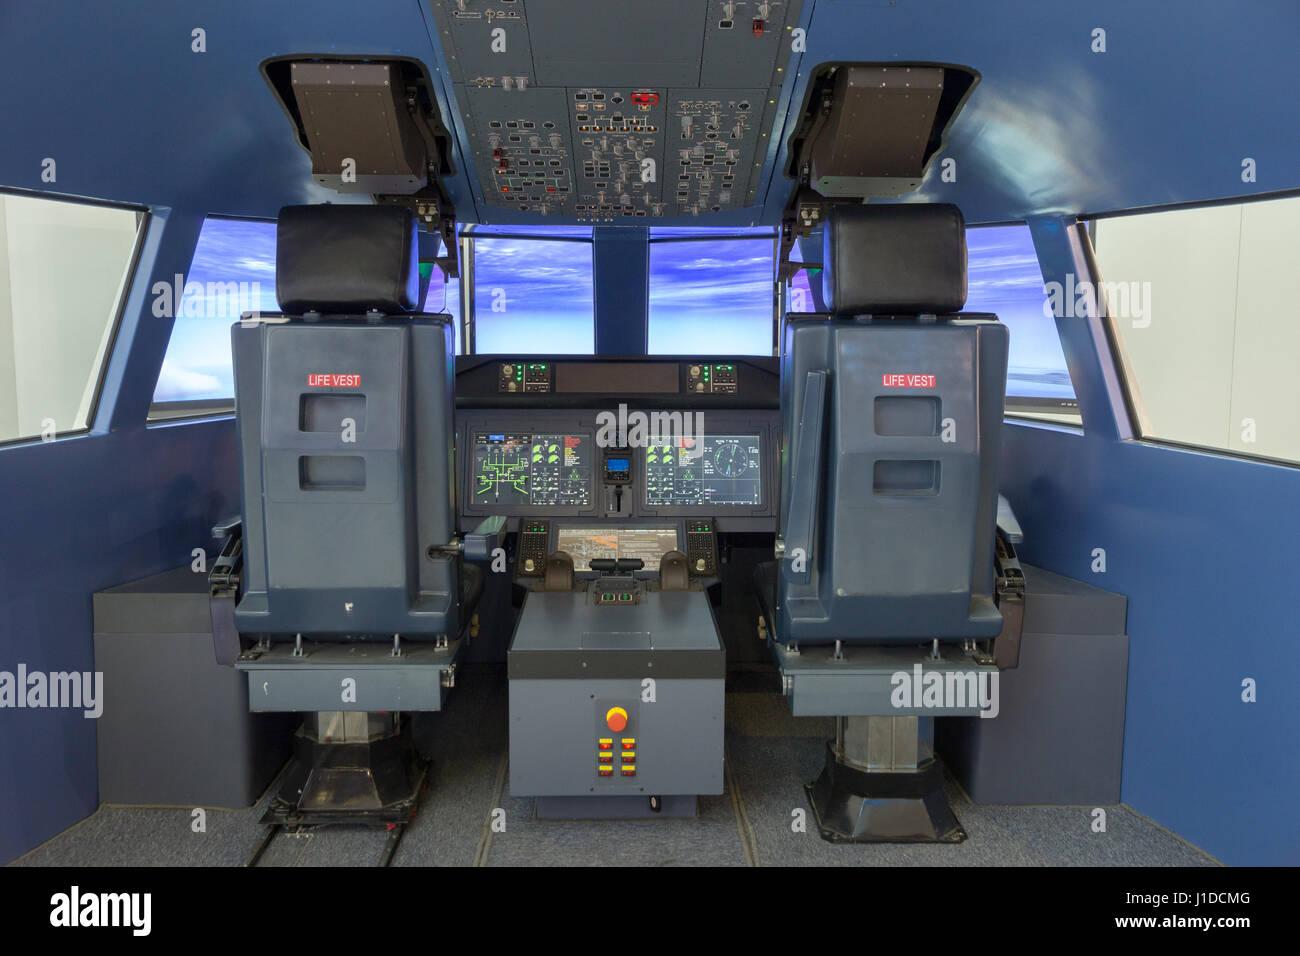 PARIS - JUN 18, 2015: Flight simulator on display at the 51st International Paris Air show. Stock Photo